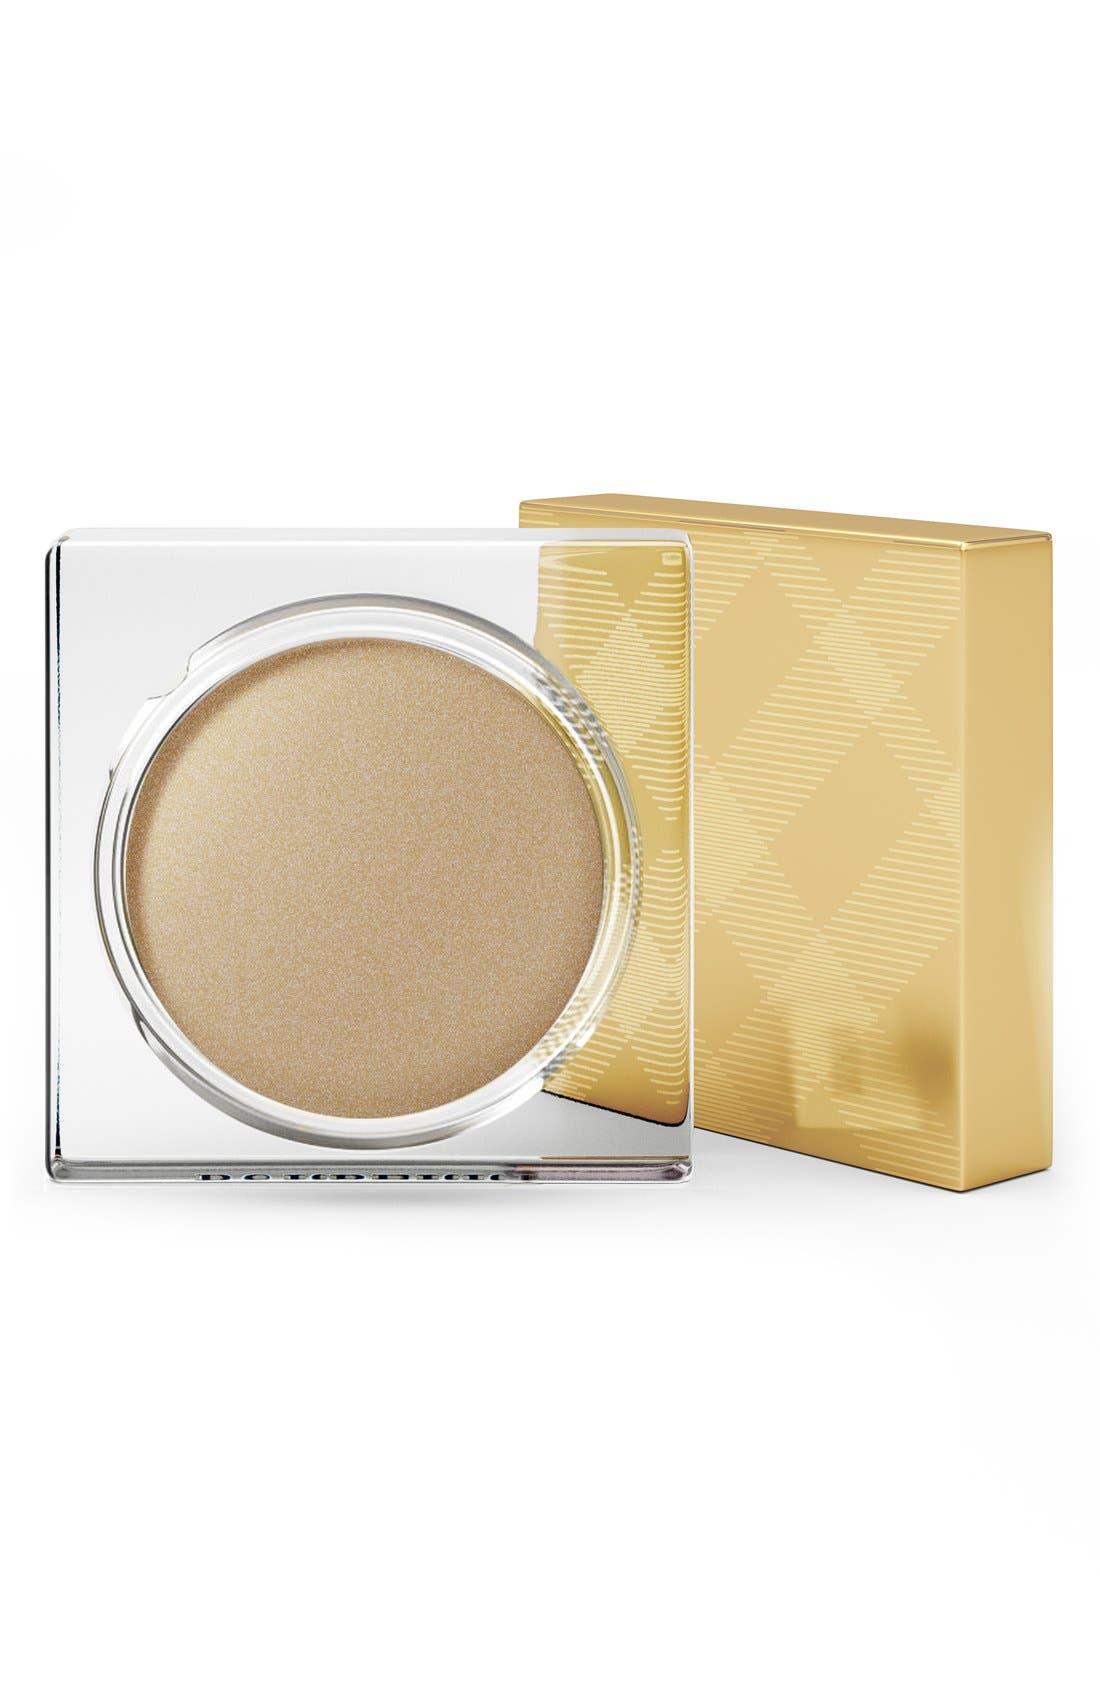 'My Burberry Gold Magic' Perfume Solid,                             Main thumbnail 1, color,